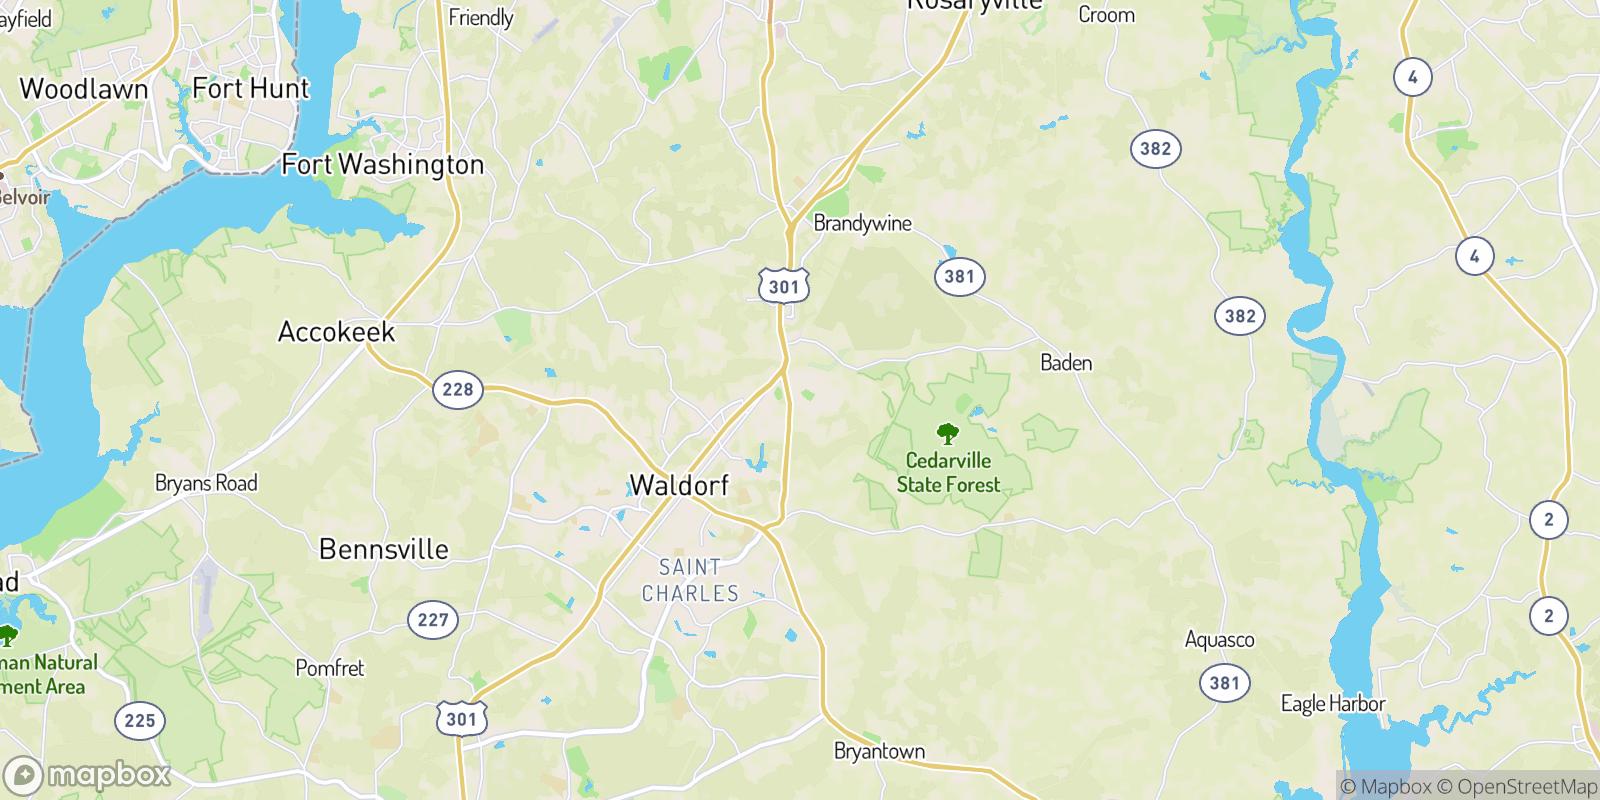 The best camping near Mattawoman Estates, Maryland